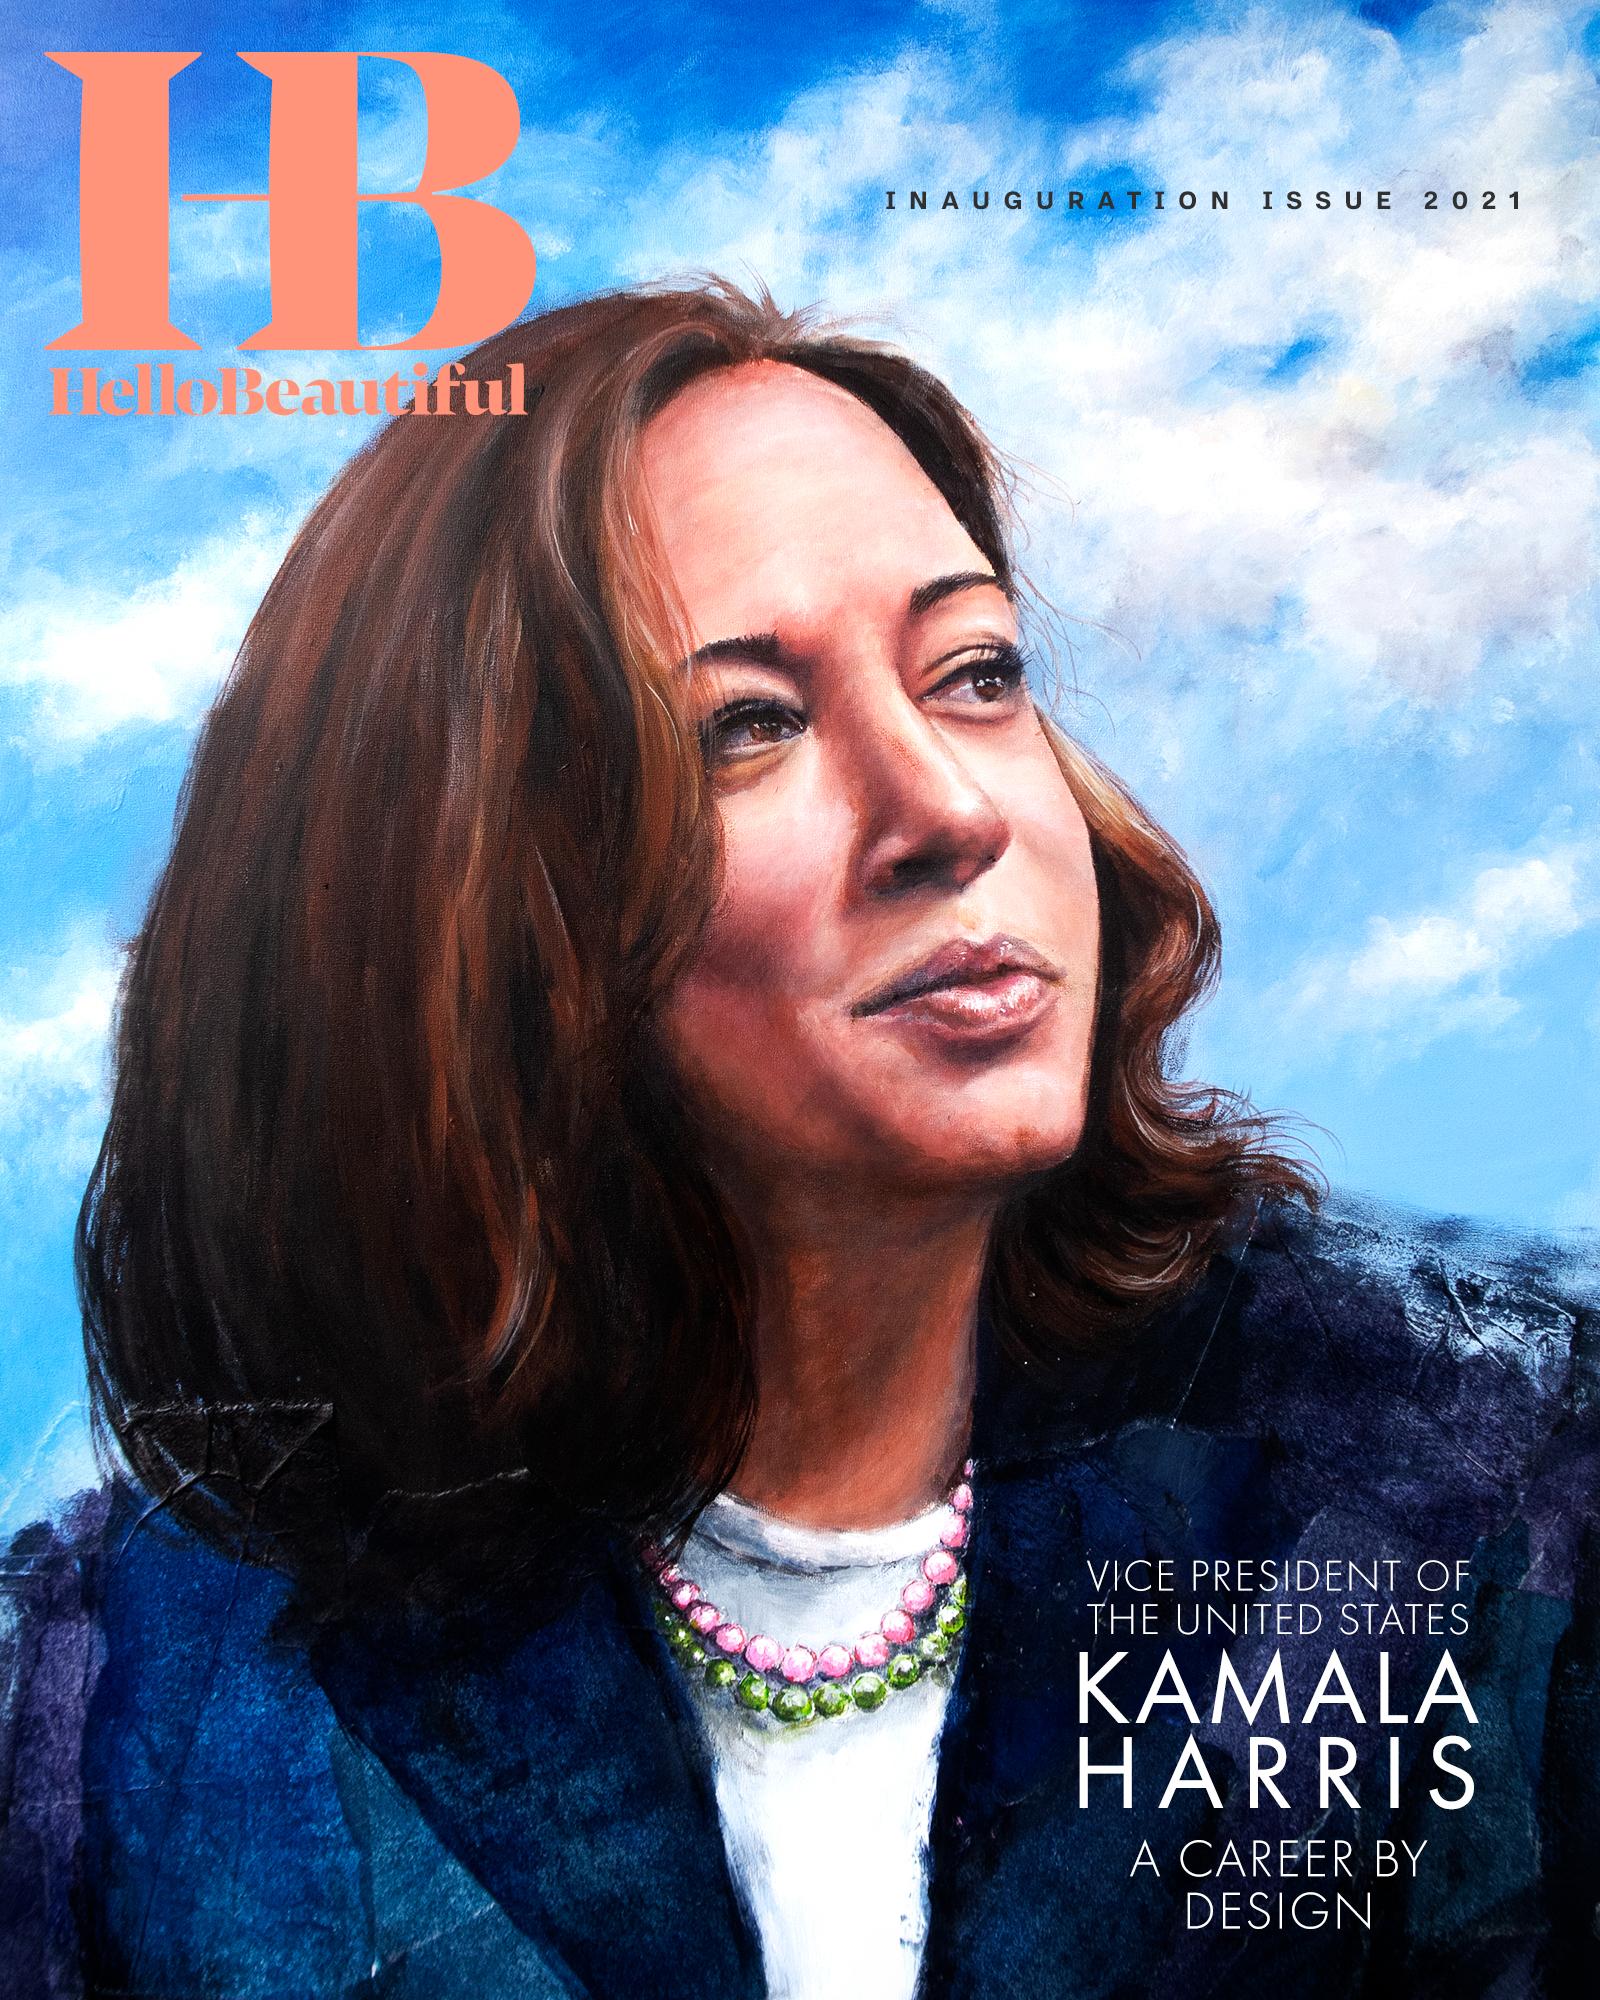 HelloBeautiful Inauguration Issue 2021 - COVER